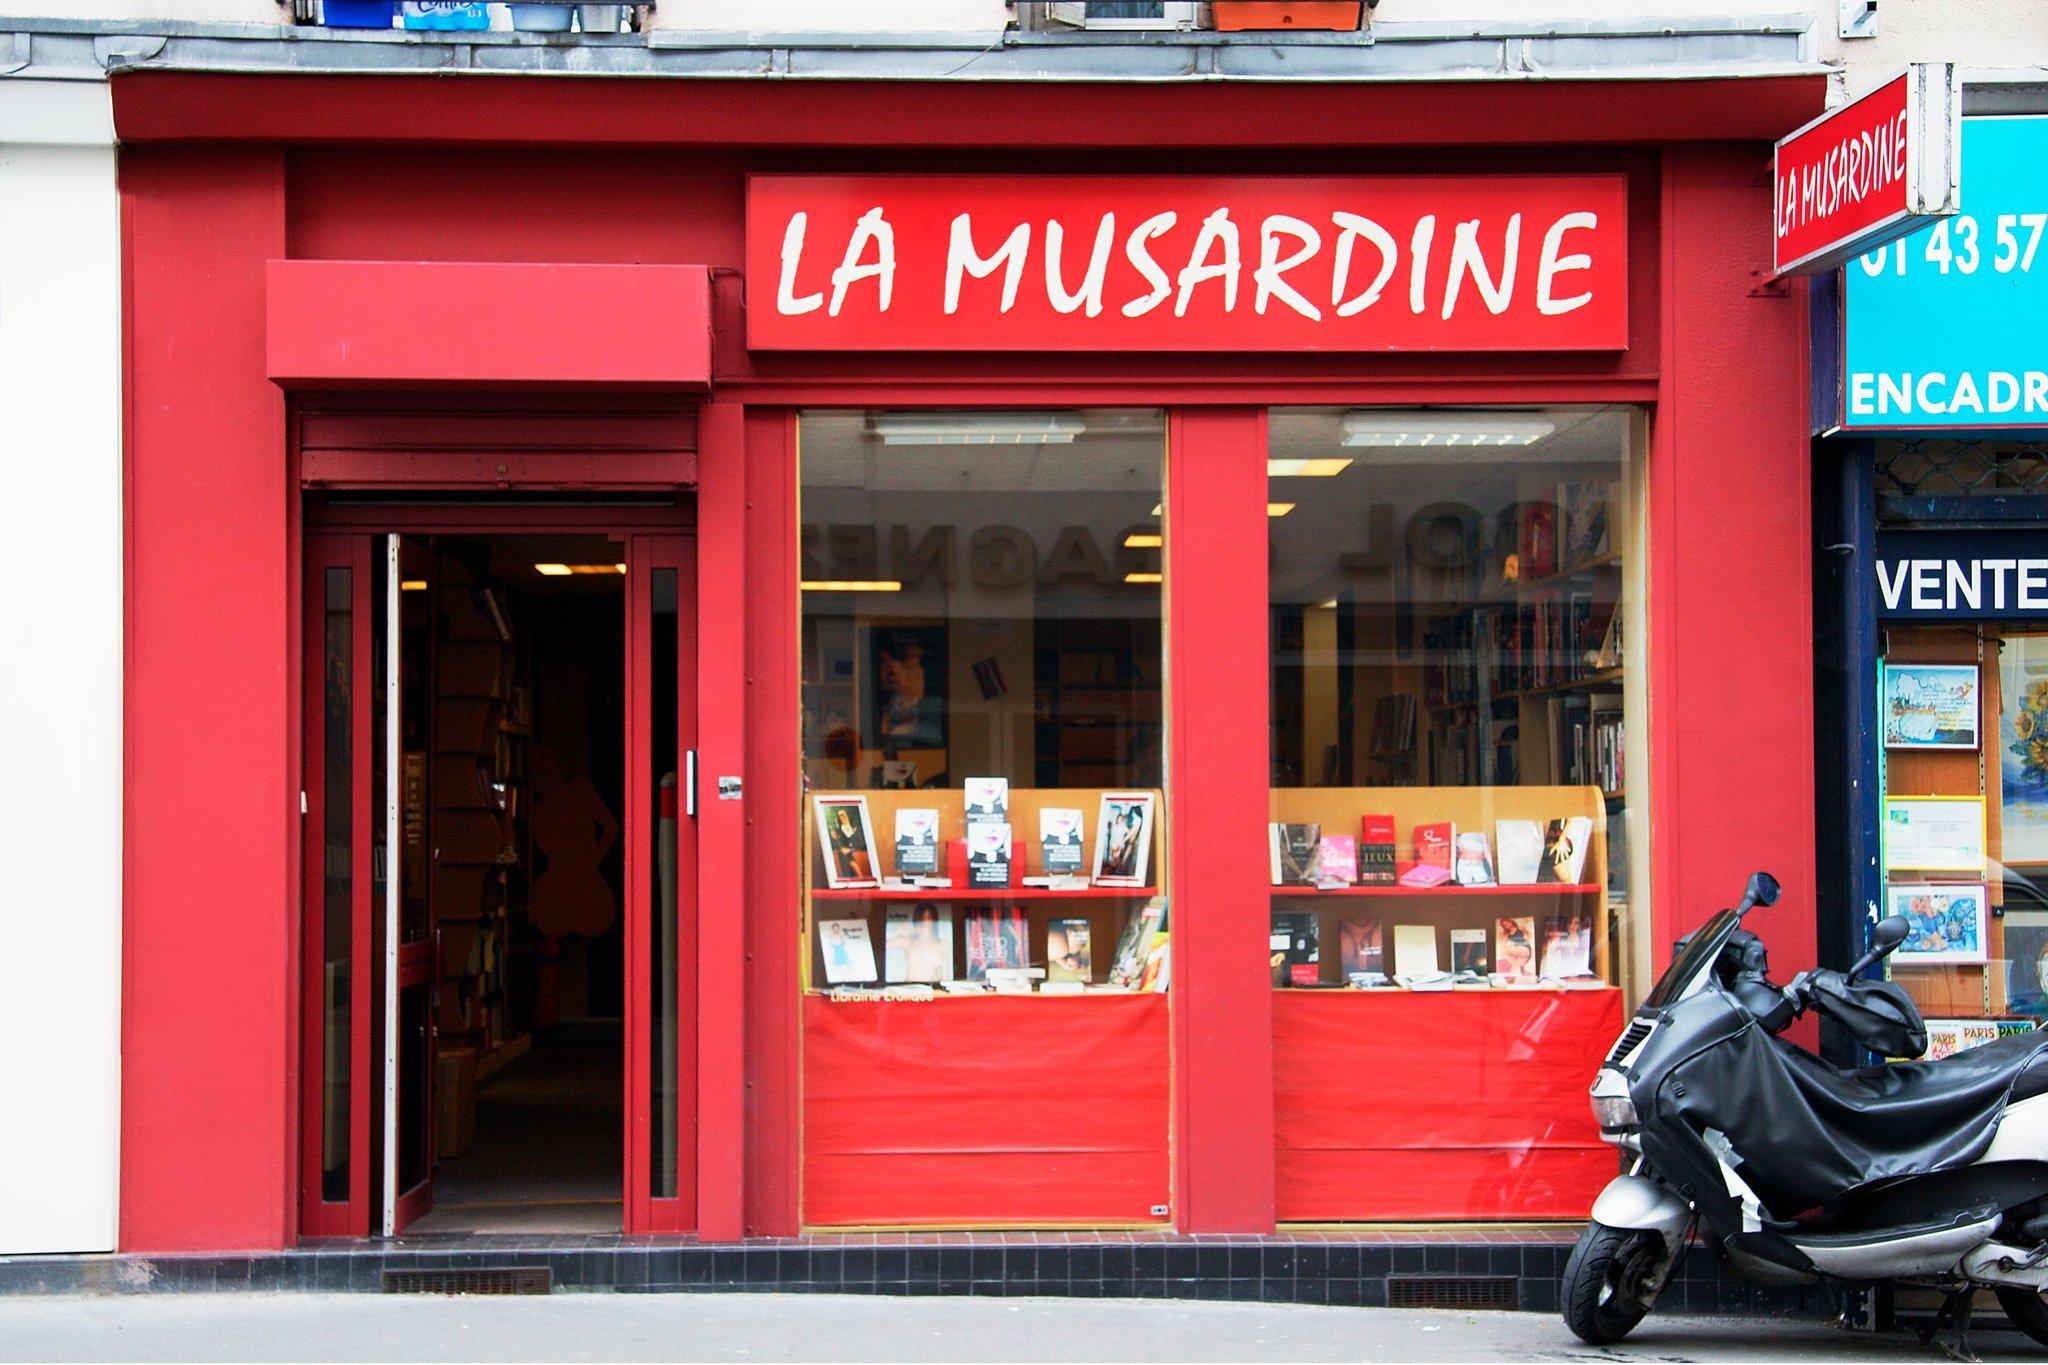 Librairie La Musardine